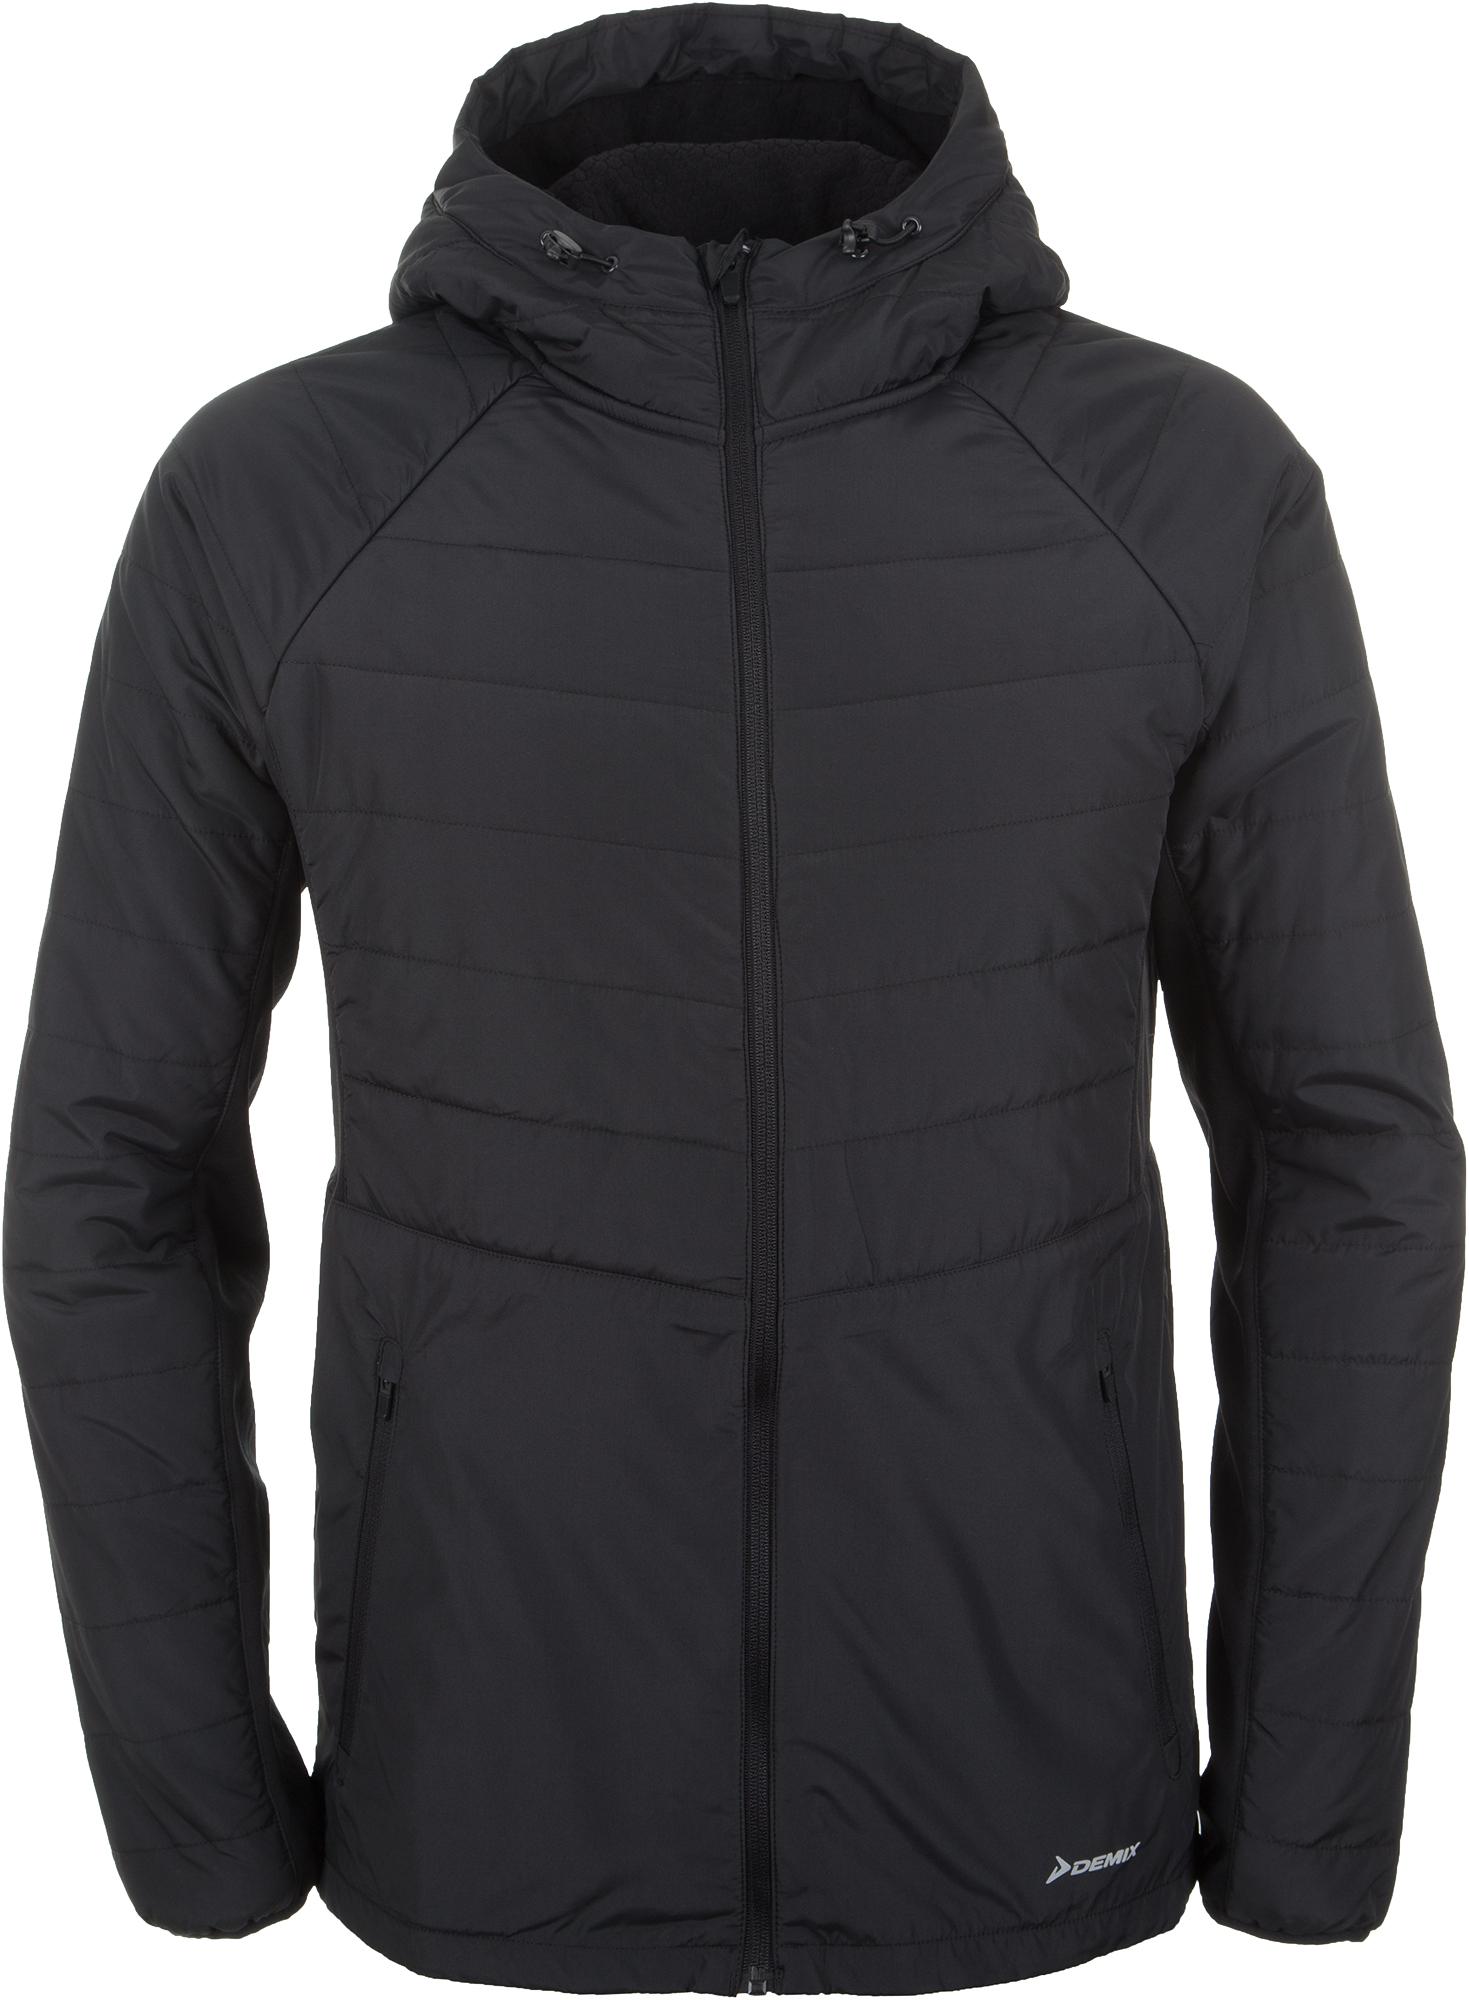 Demix Куртка утепленная мужская Demix, размер 52